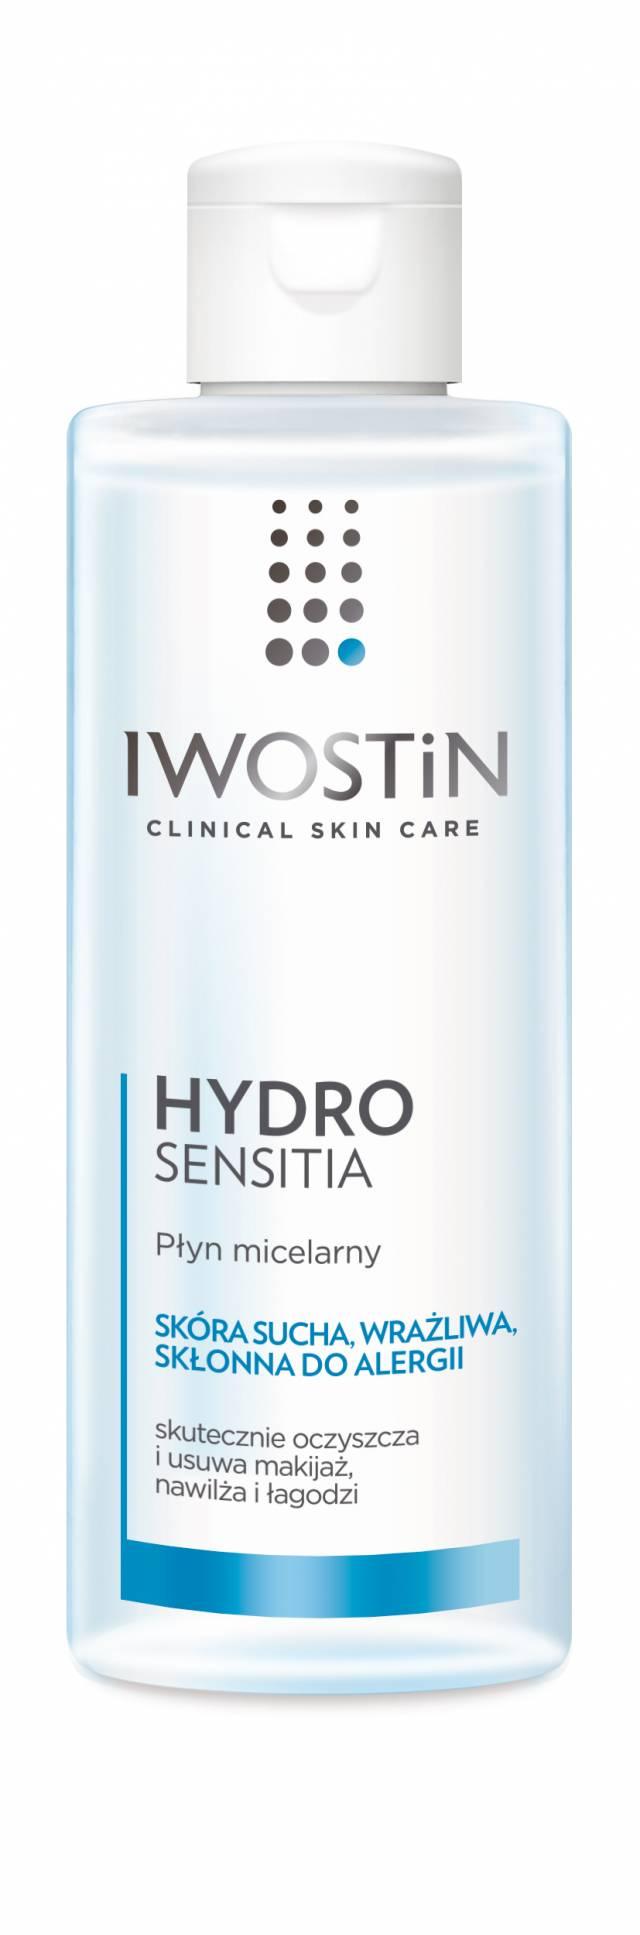 IWOSTIN HYDRO SENSITIA Micelarny liquid do skóry suchej 215m